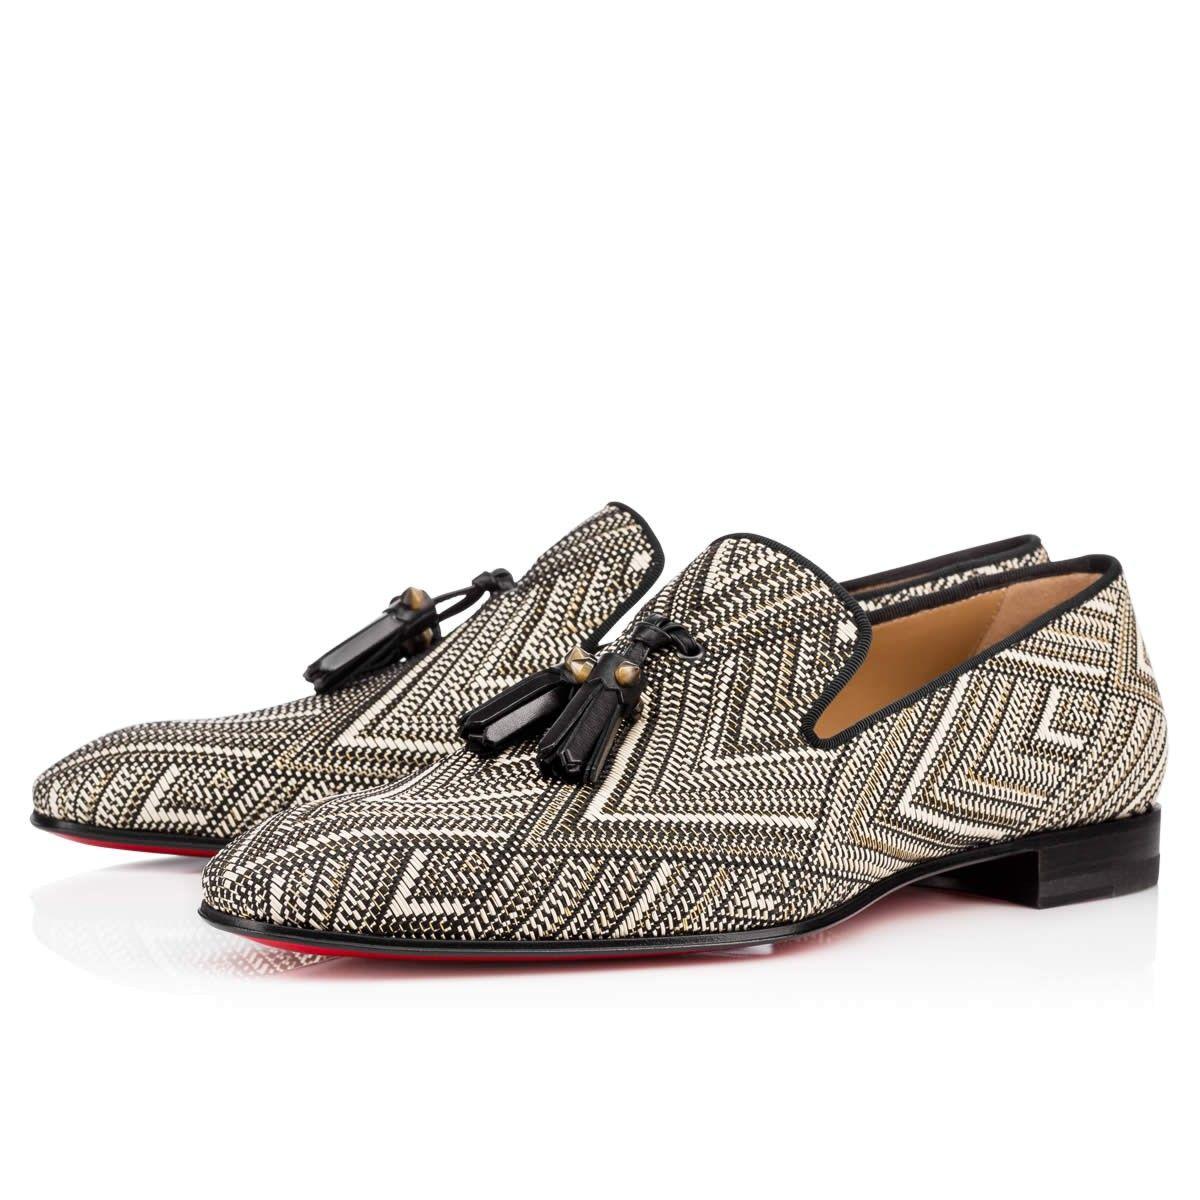 f6aefd557c0 CHRISTIAN LOUBOUTIN Dandelion Tassel Tresse Royal Black White Rafia - Men  Shoes - Christian Louboutin.  christianlouboutin  shoes